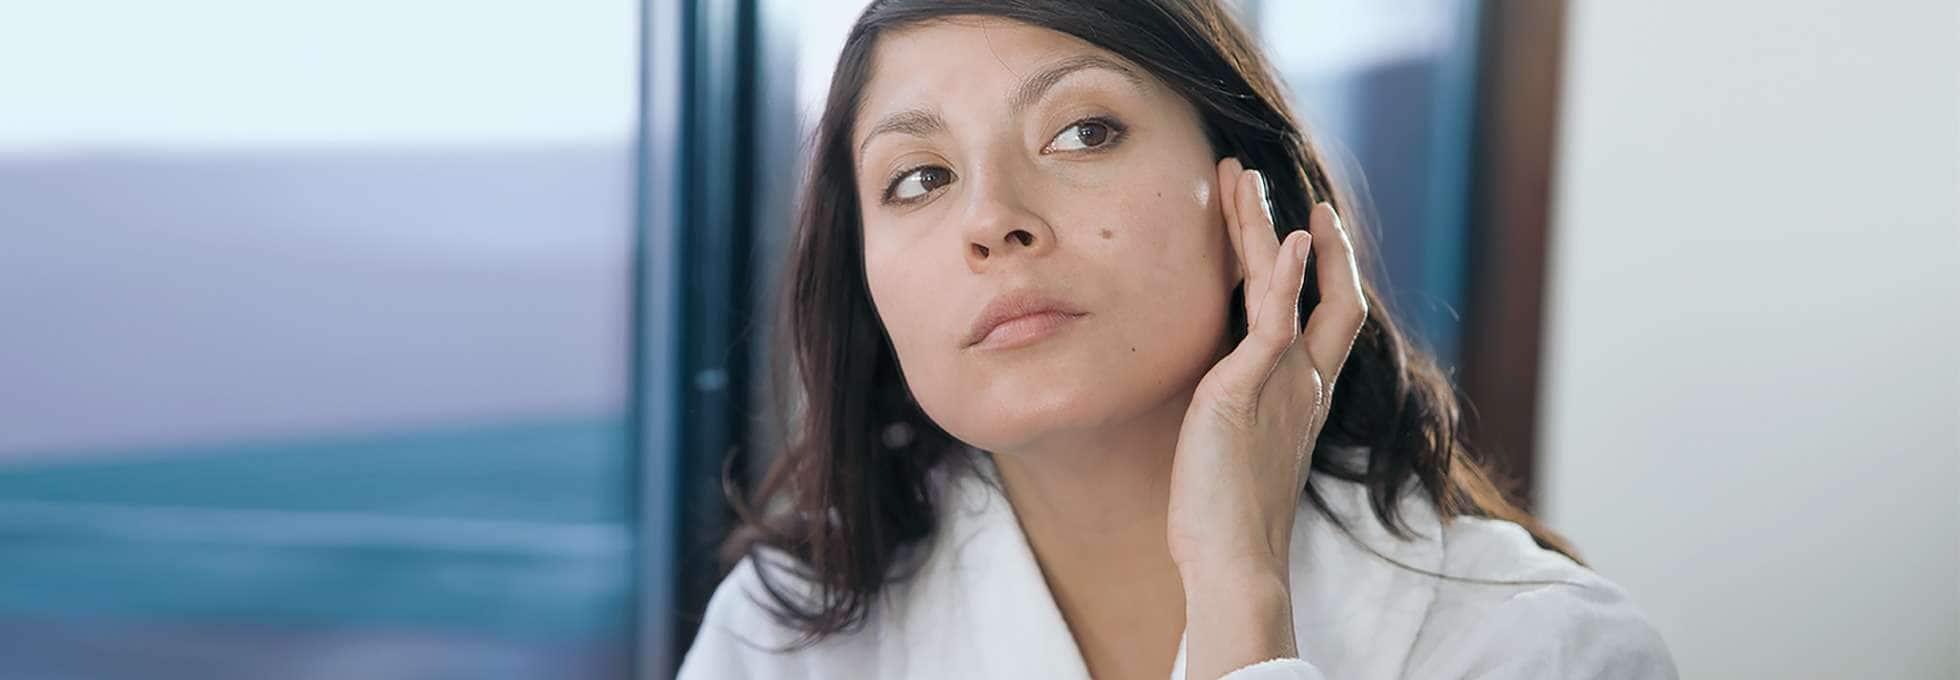 How to Treat Dry Skin Around the Eyes | Vaseline® | Unilever Vaseline®